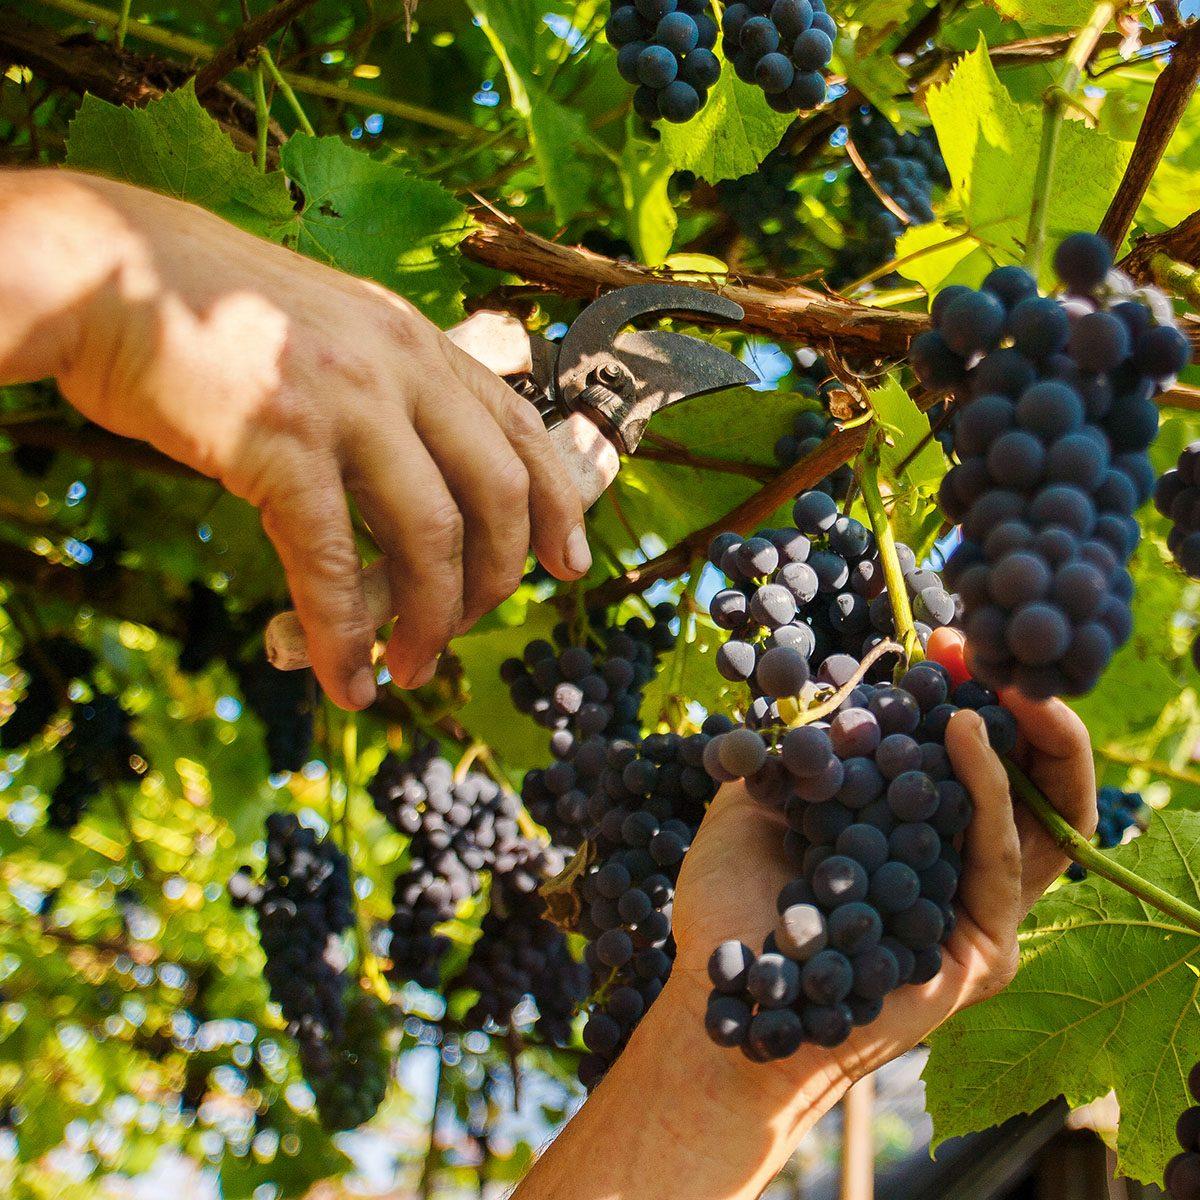 Harvesting in the vineyards.